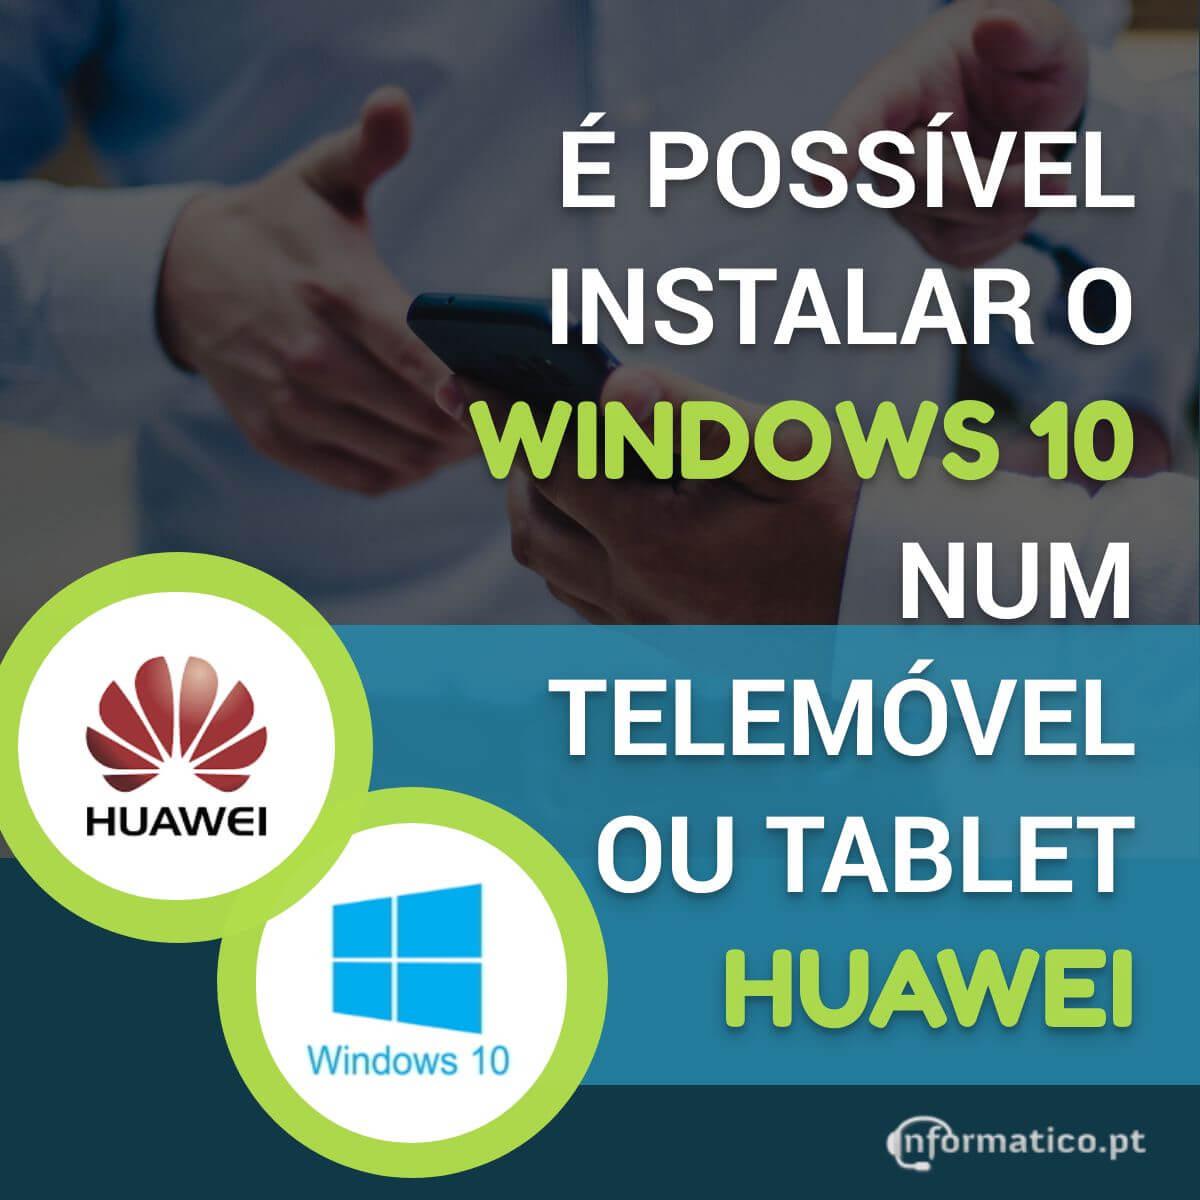 Windows 10 a correr num smartphone Huawei